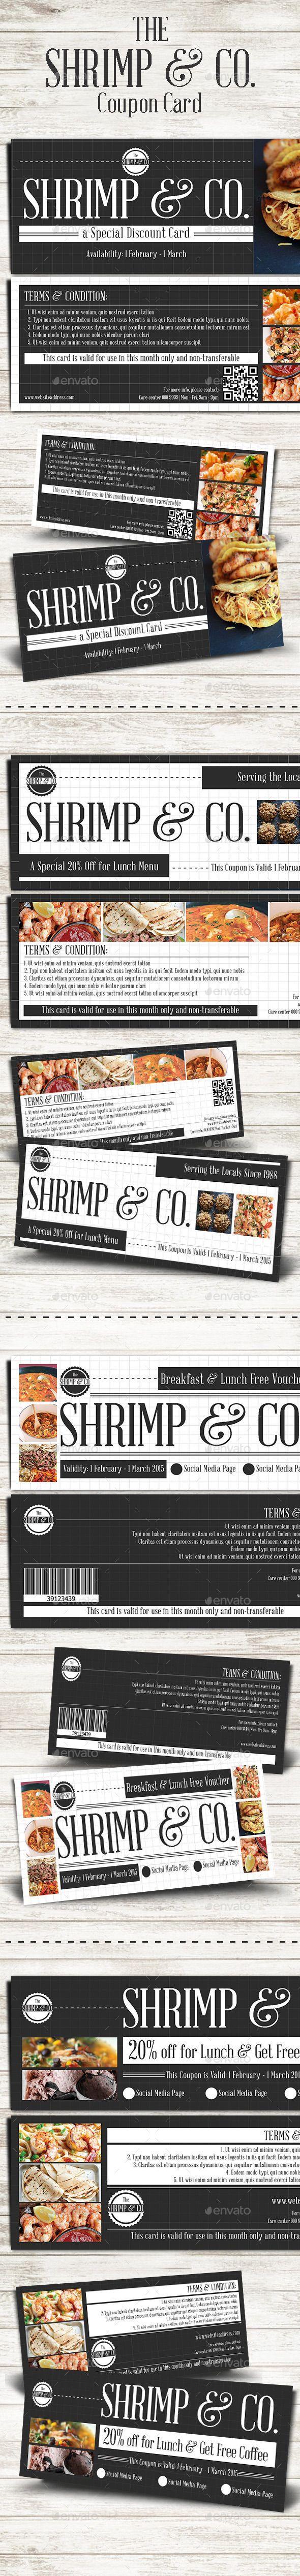 Seafood Cafe Coupon Card Restaurant Types Coupons Seafood